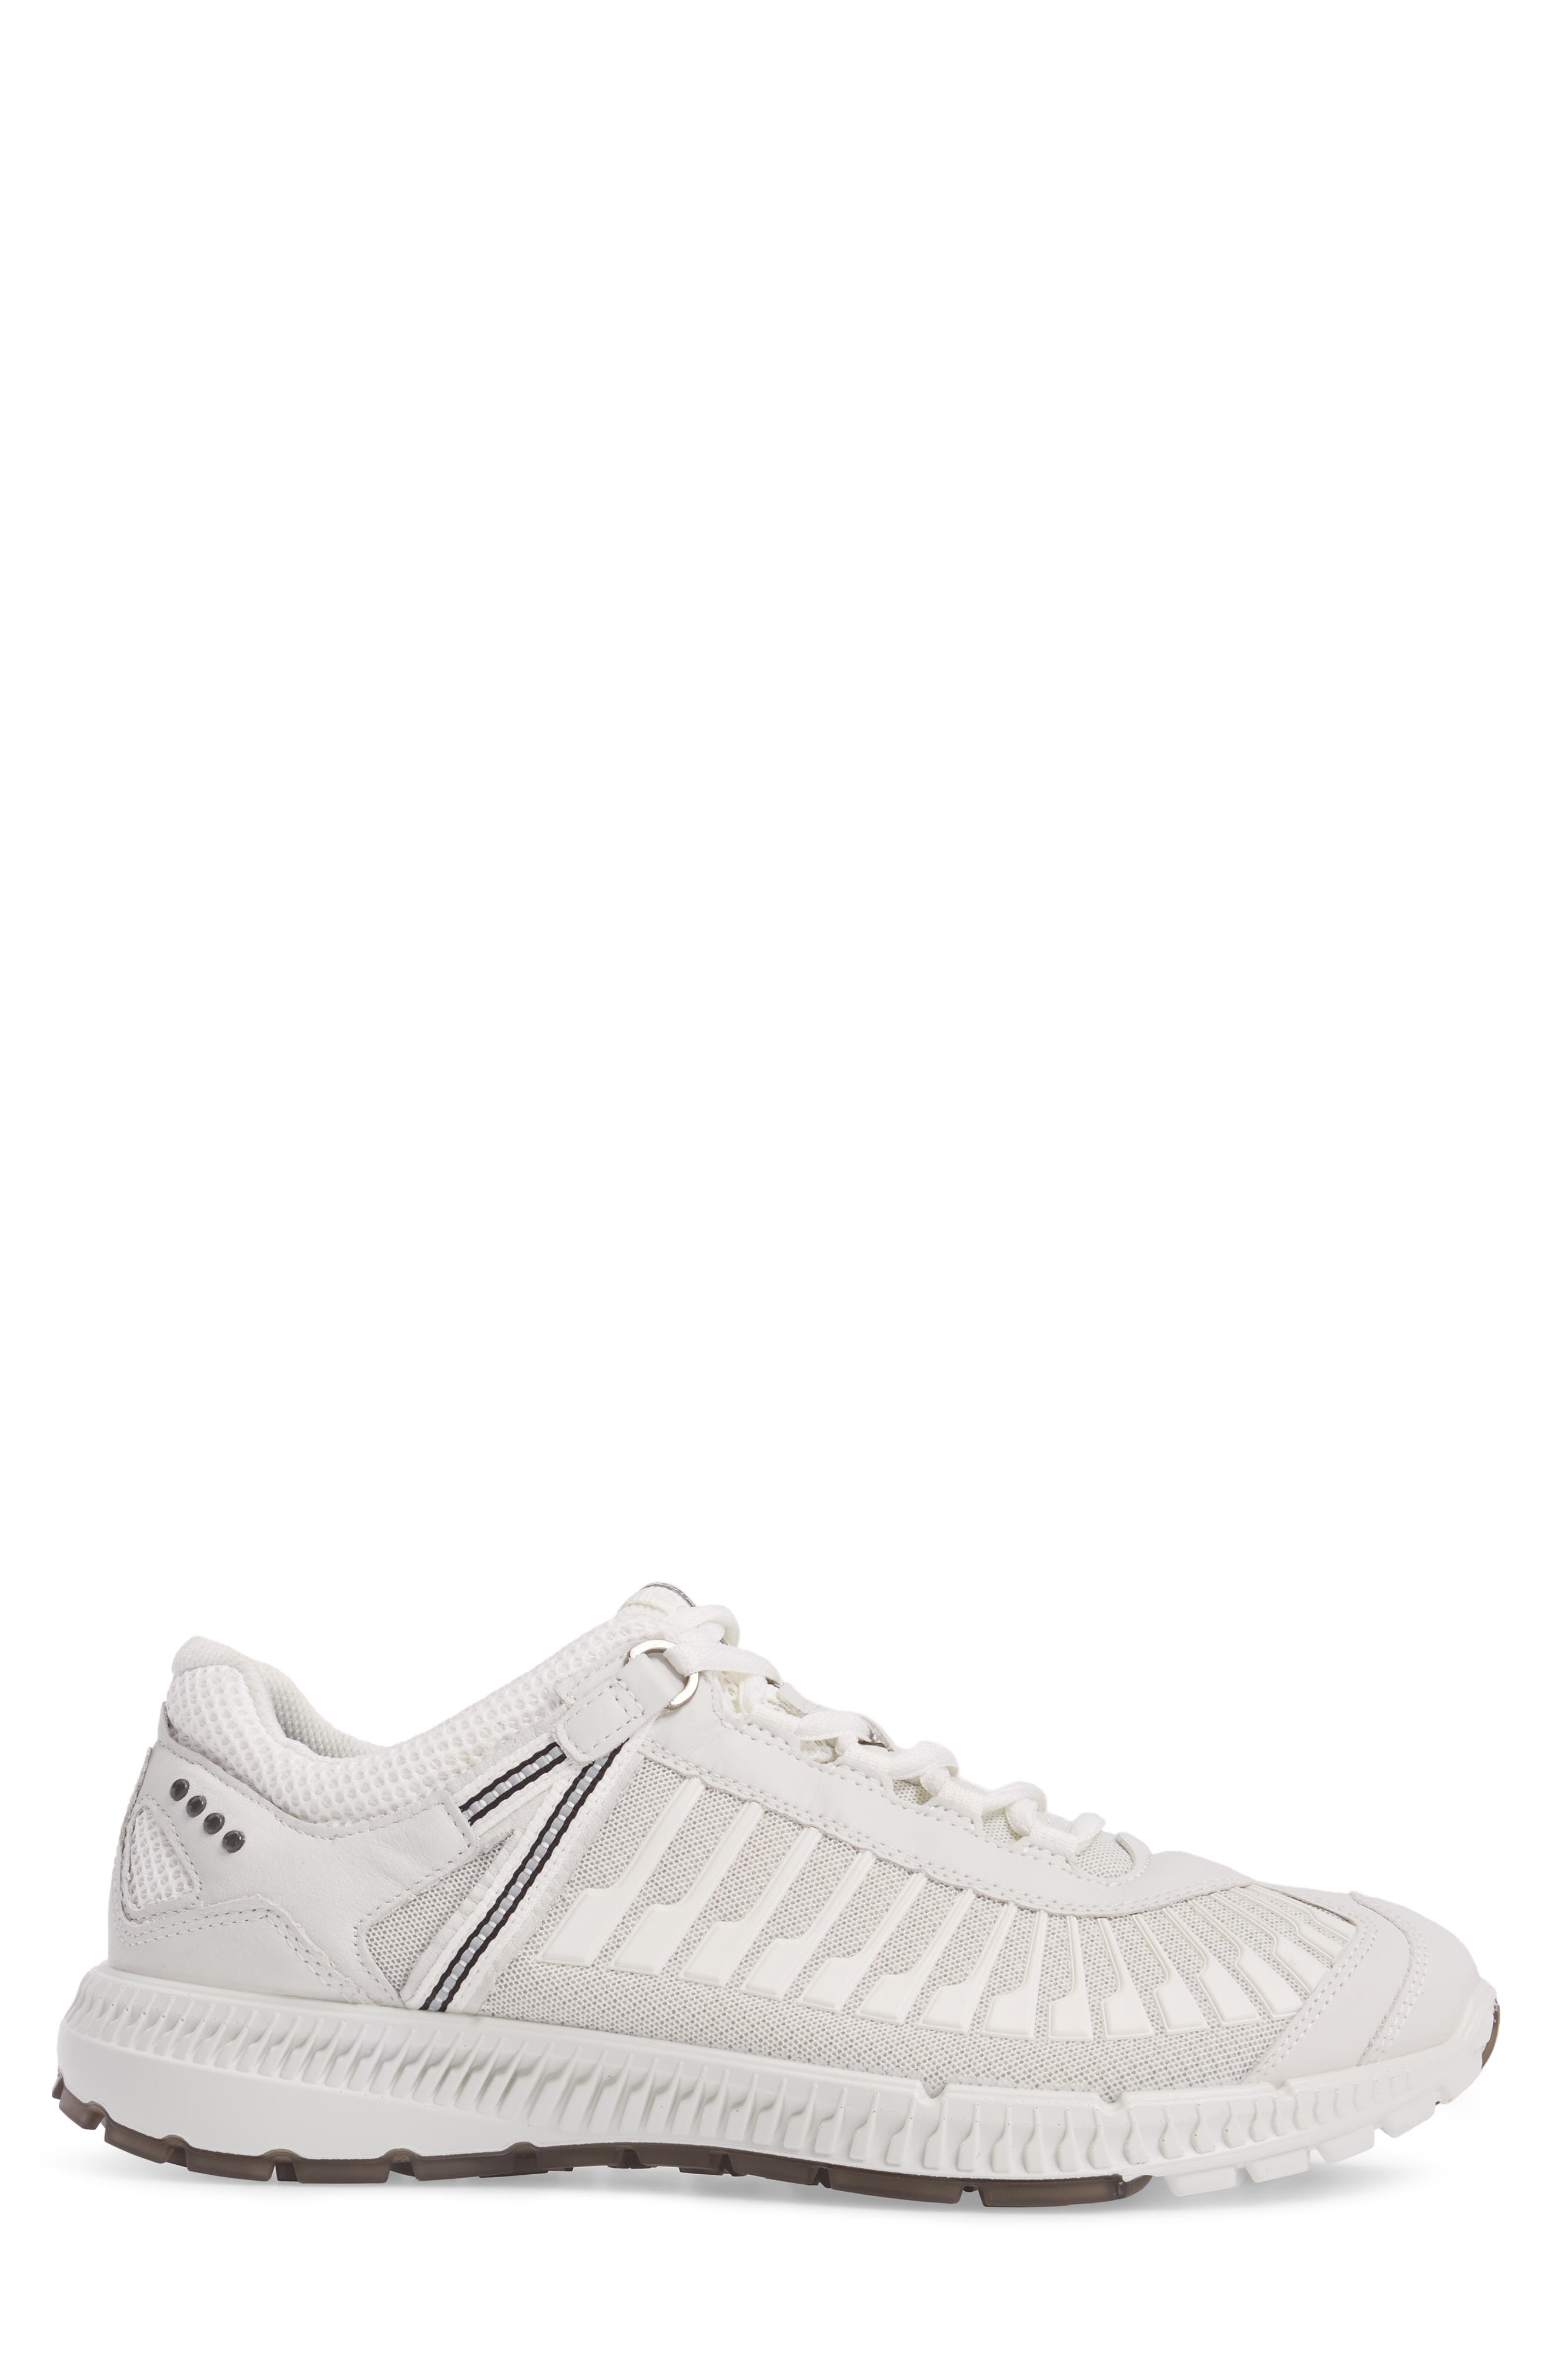 Intrinsic TR Run Sneaker,                             Alternate thumbnail 3, color,                             White Leather